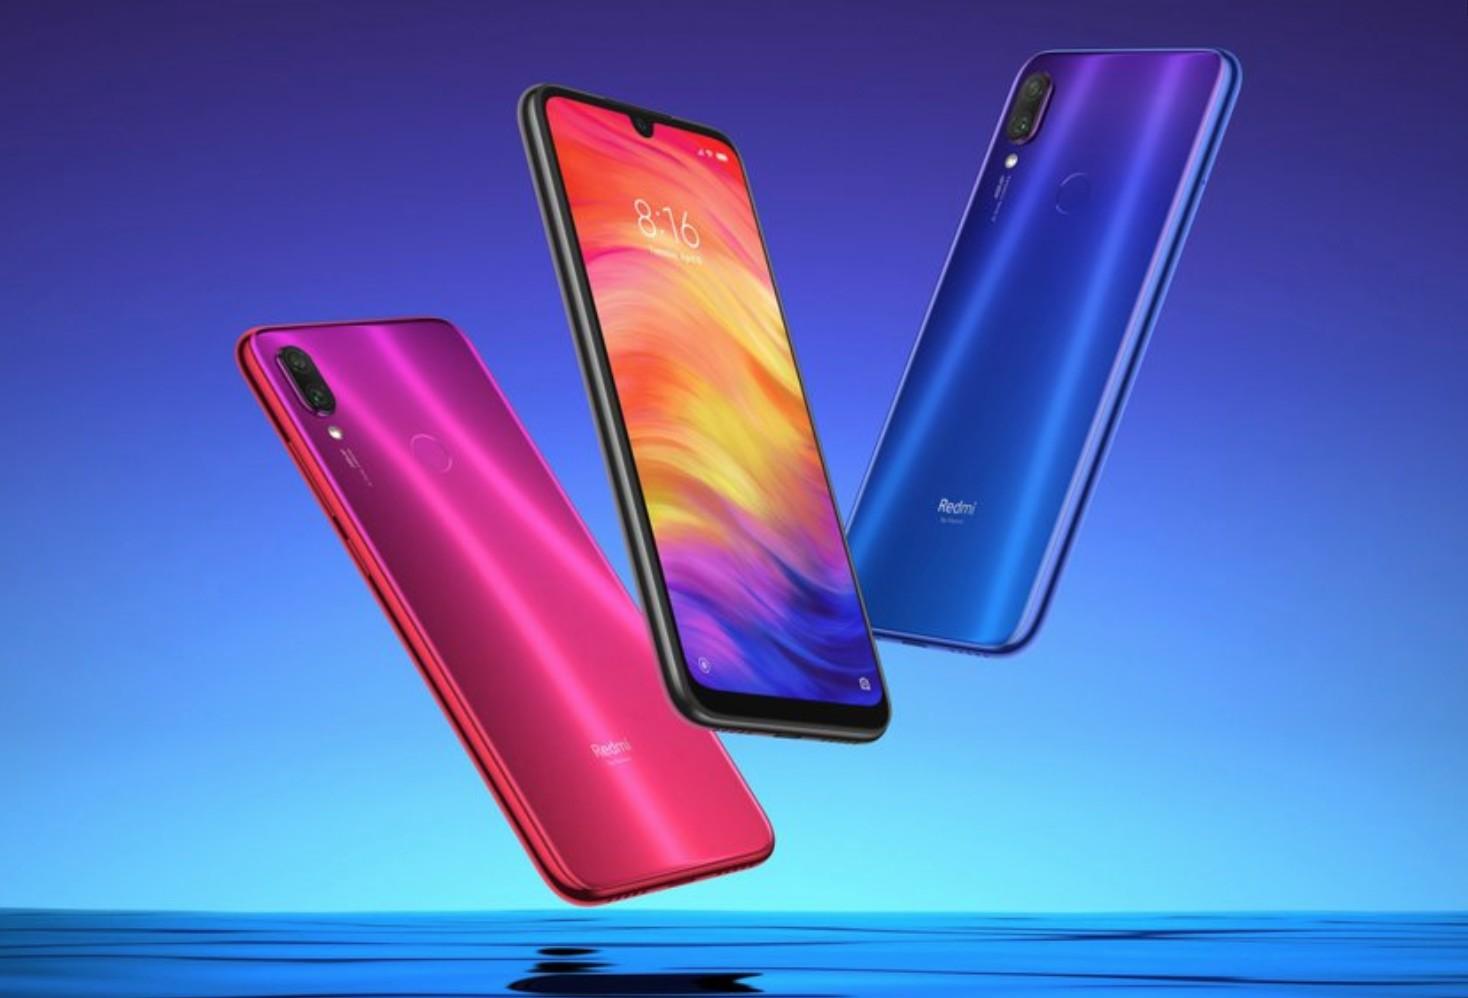 المقارنة الكاملة بين هاتف Huawei P30 Lite وهاتف Redmi Note 7